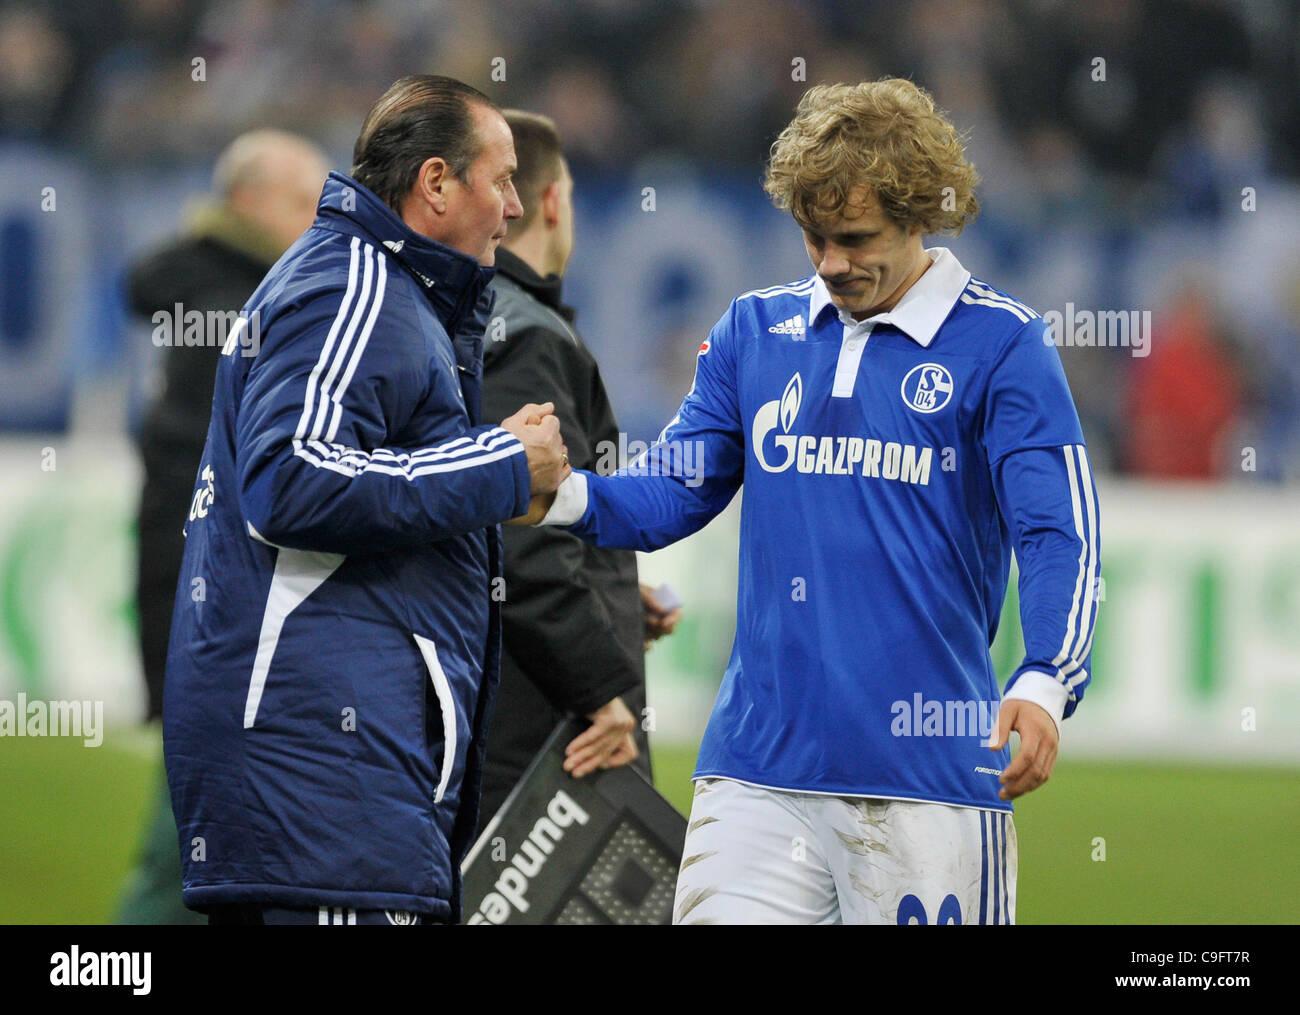 german Football Bundesliga, Season 2011/2012, 17th matchday, 17.12.2011, Schalke 04 (S04) vs. Werder Bremen 5:0 - Stock Image